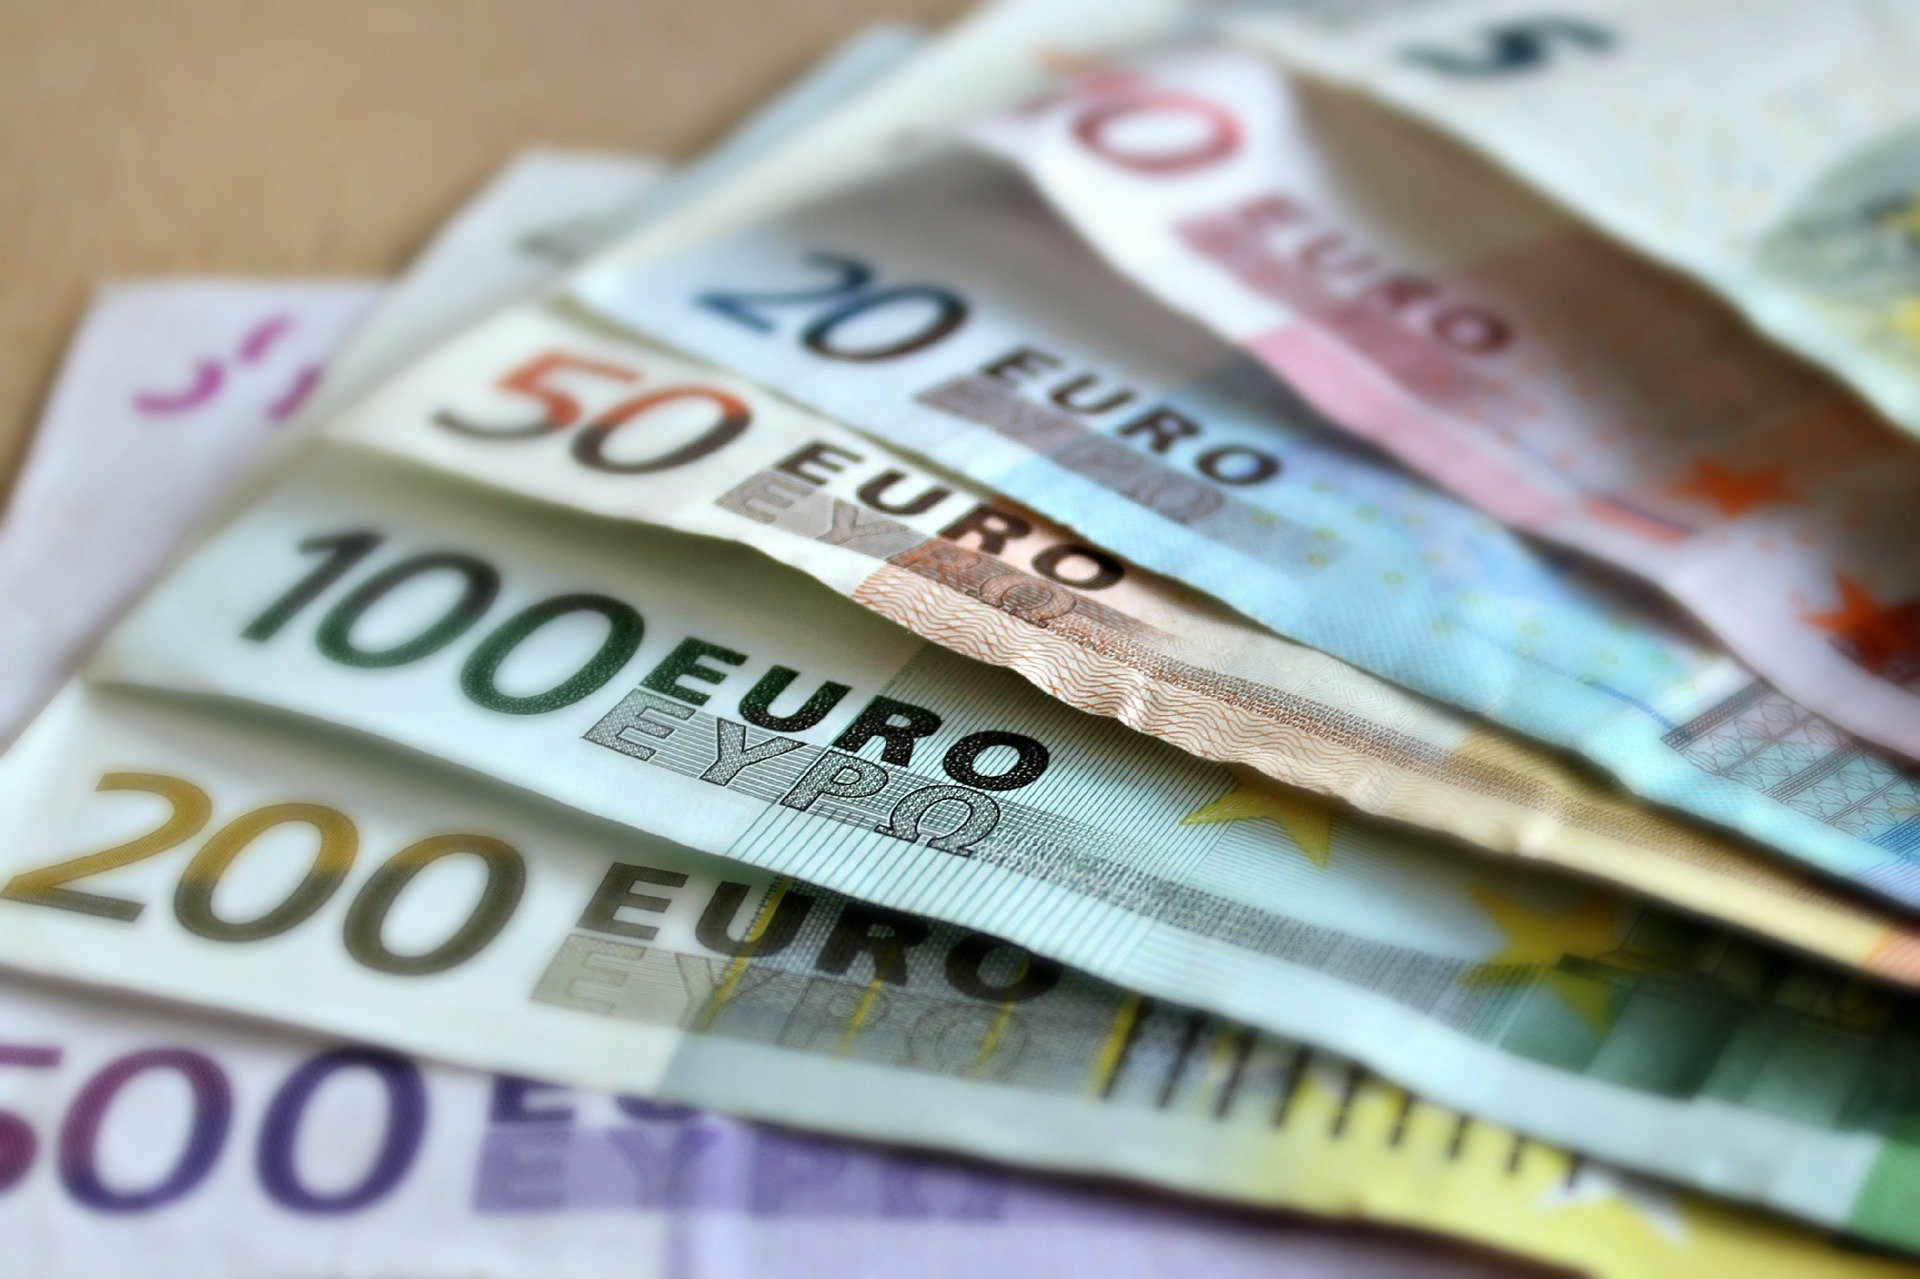 Euros in several denominations.